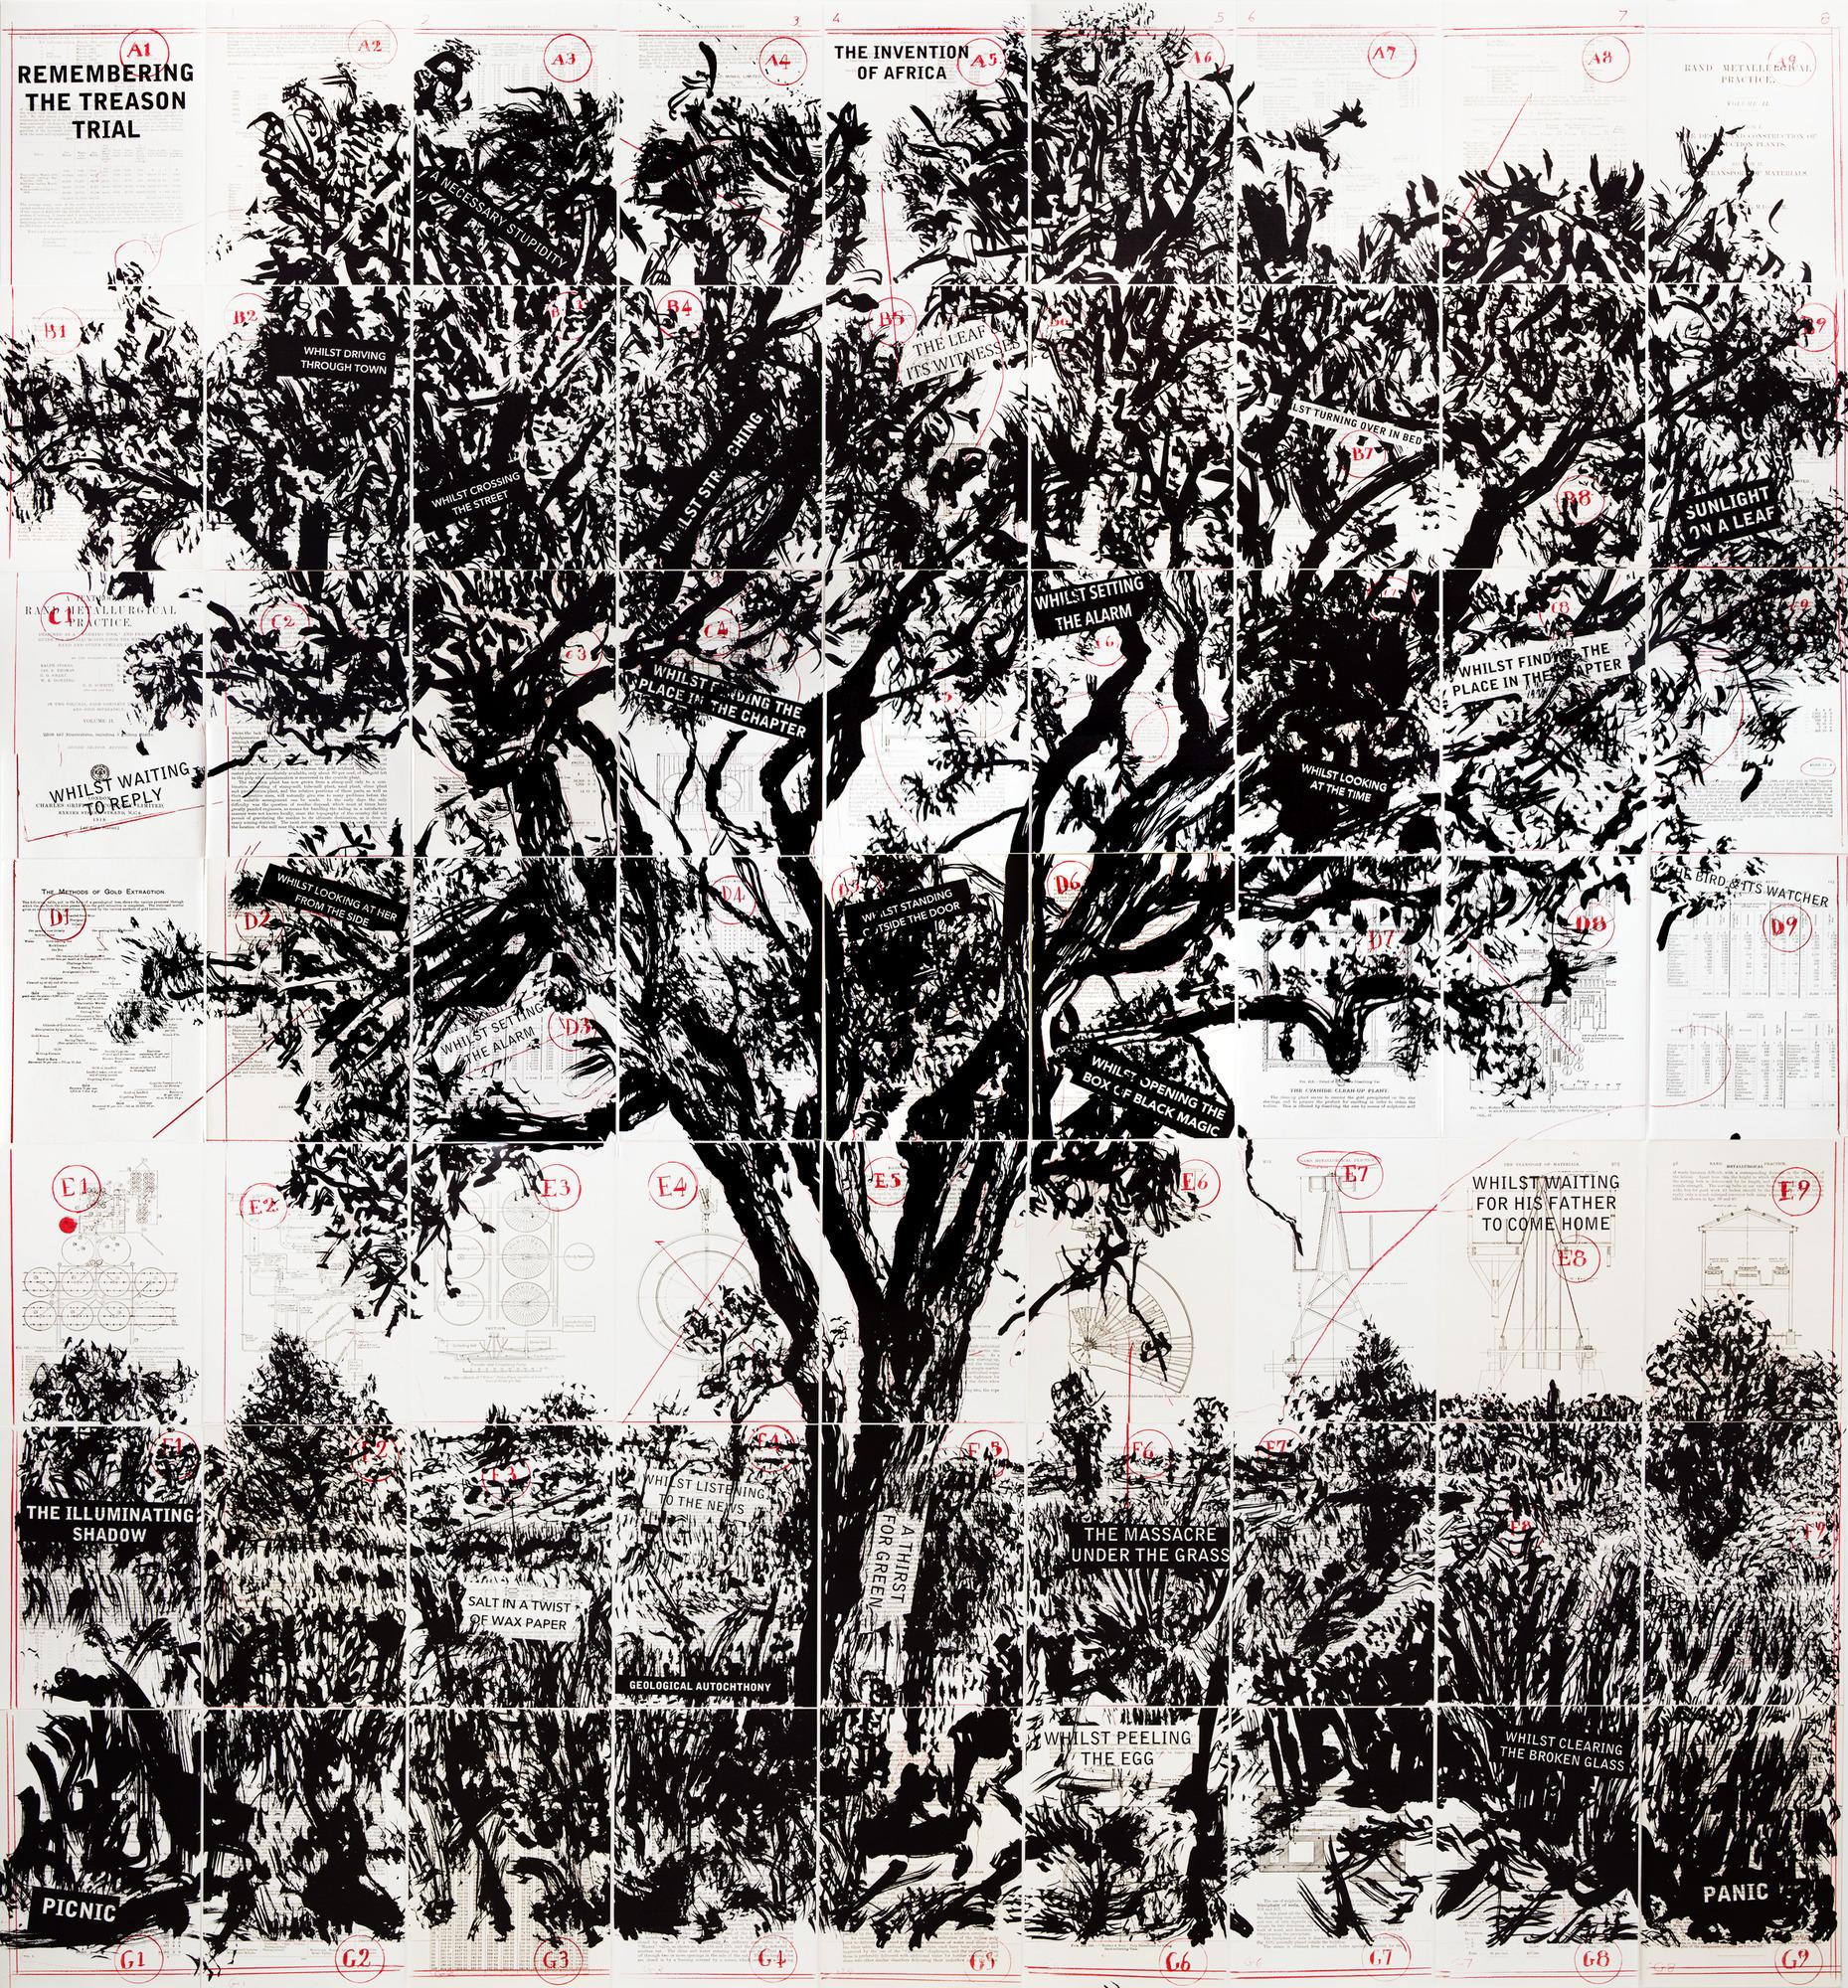 Remembering the Treason Trial, 2013, lithographie sur papier.